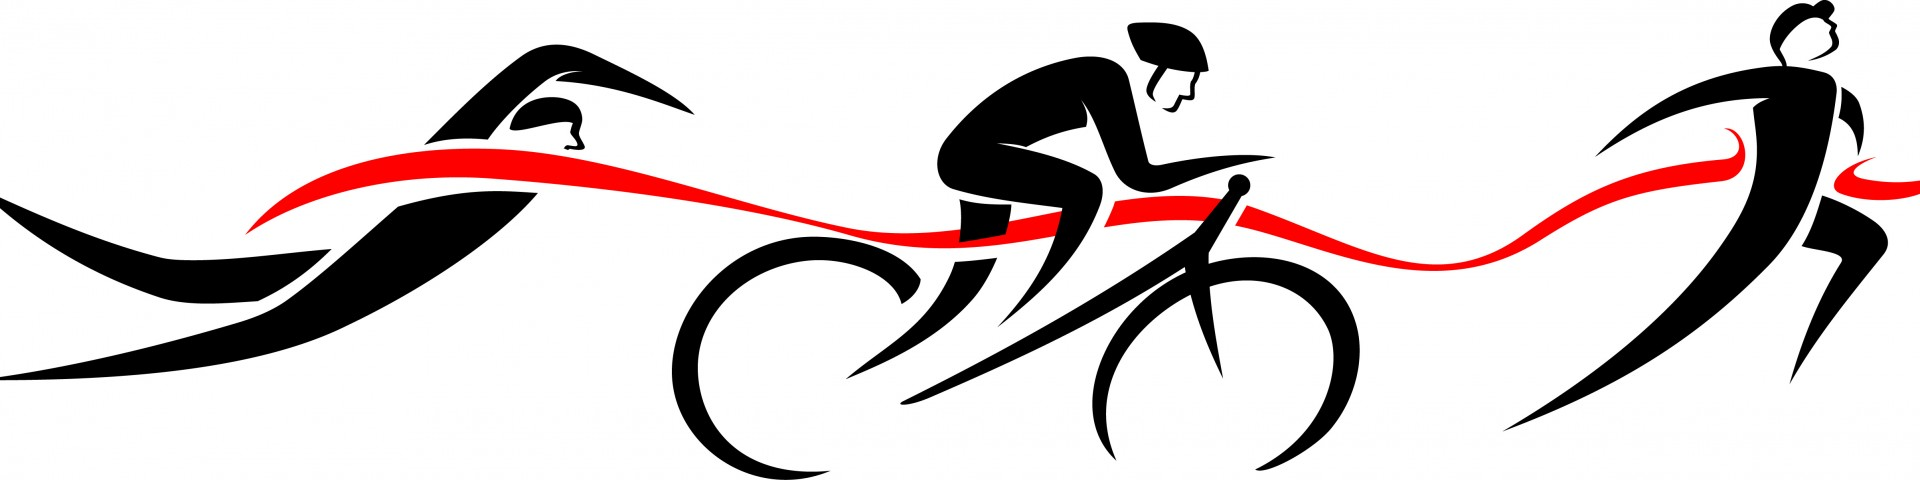 Triathlon-sportarten-tkg